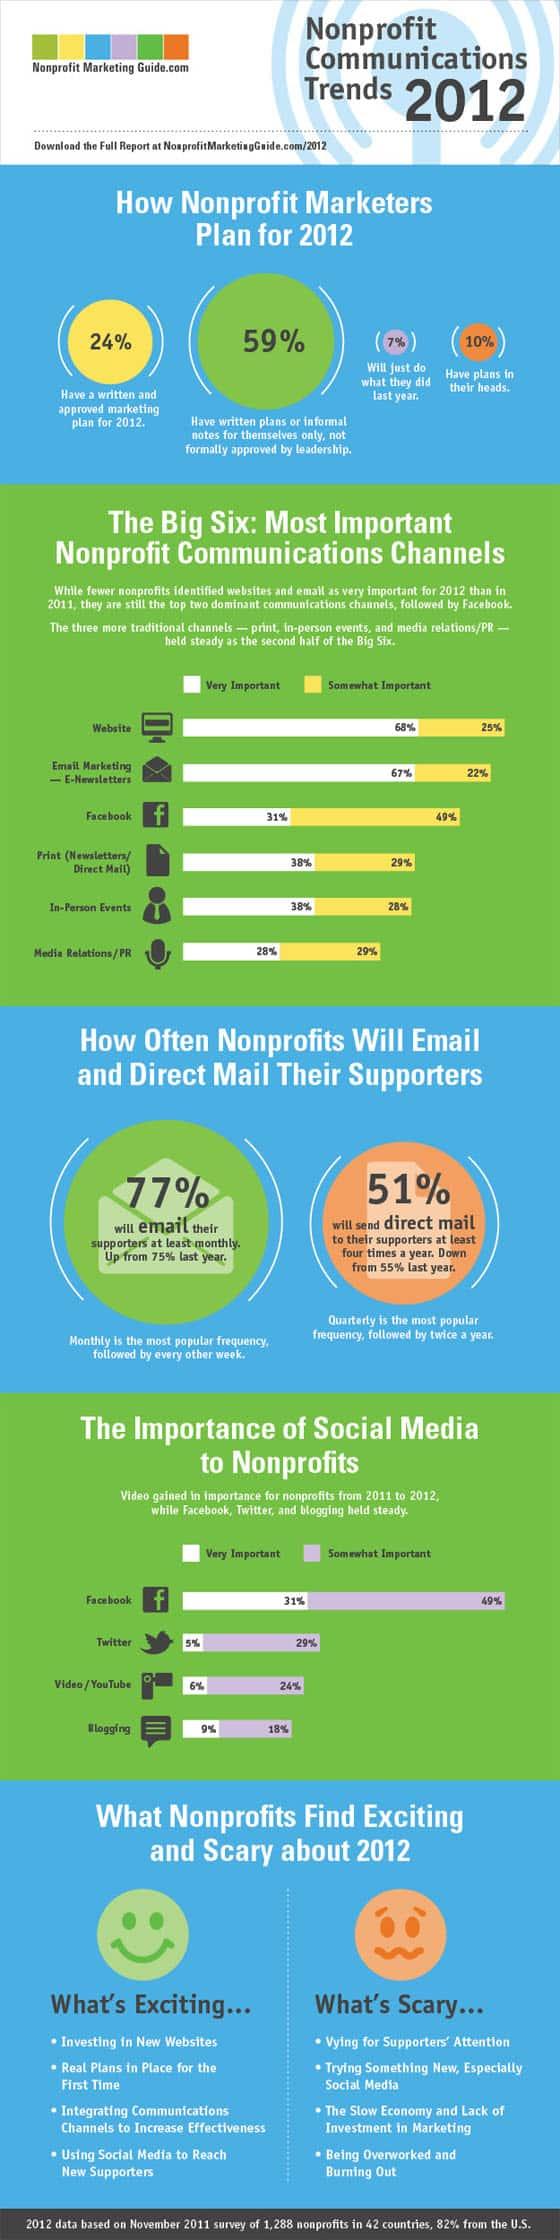 2012 Nonprofit Communications Trends Report